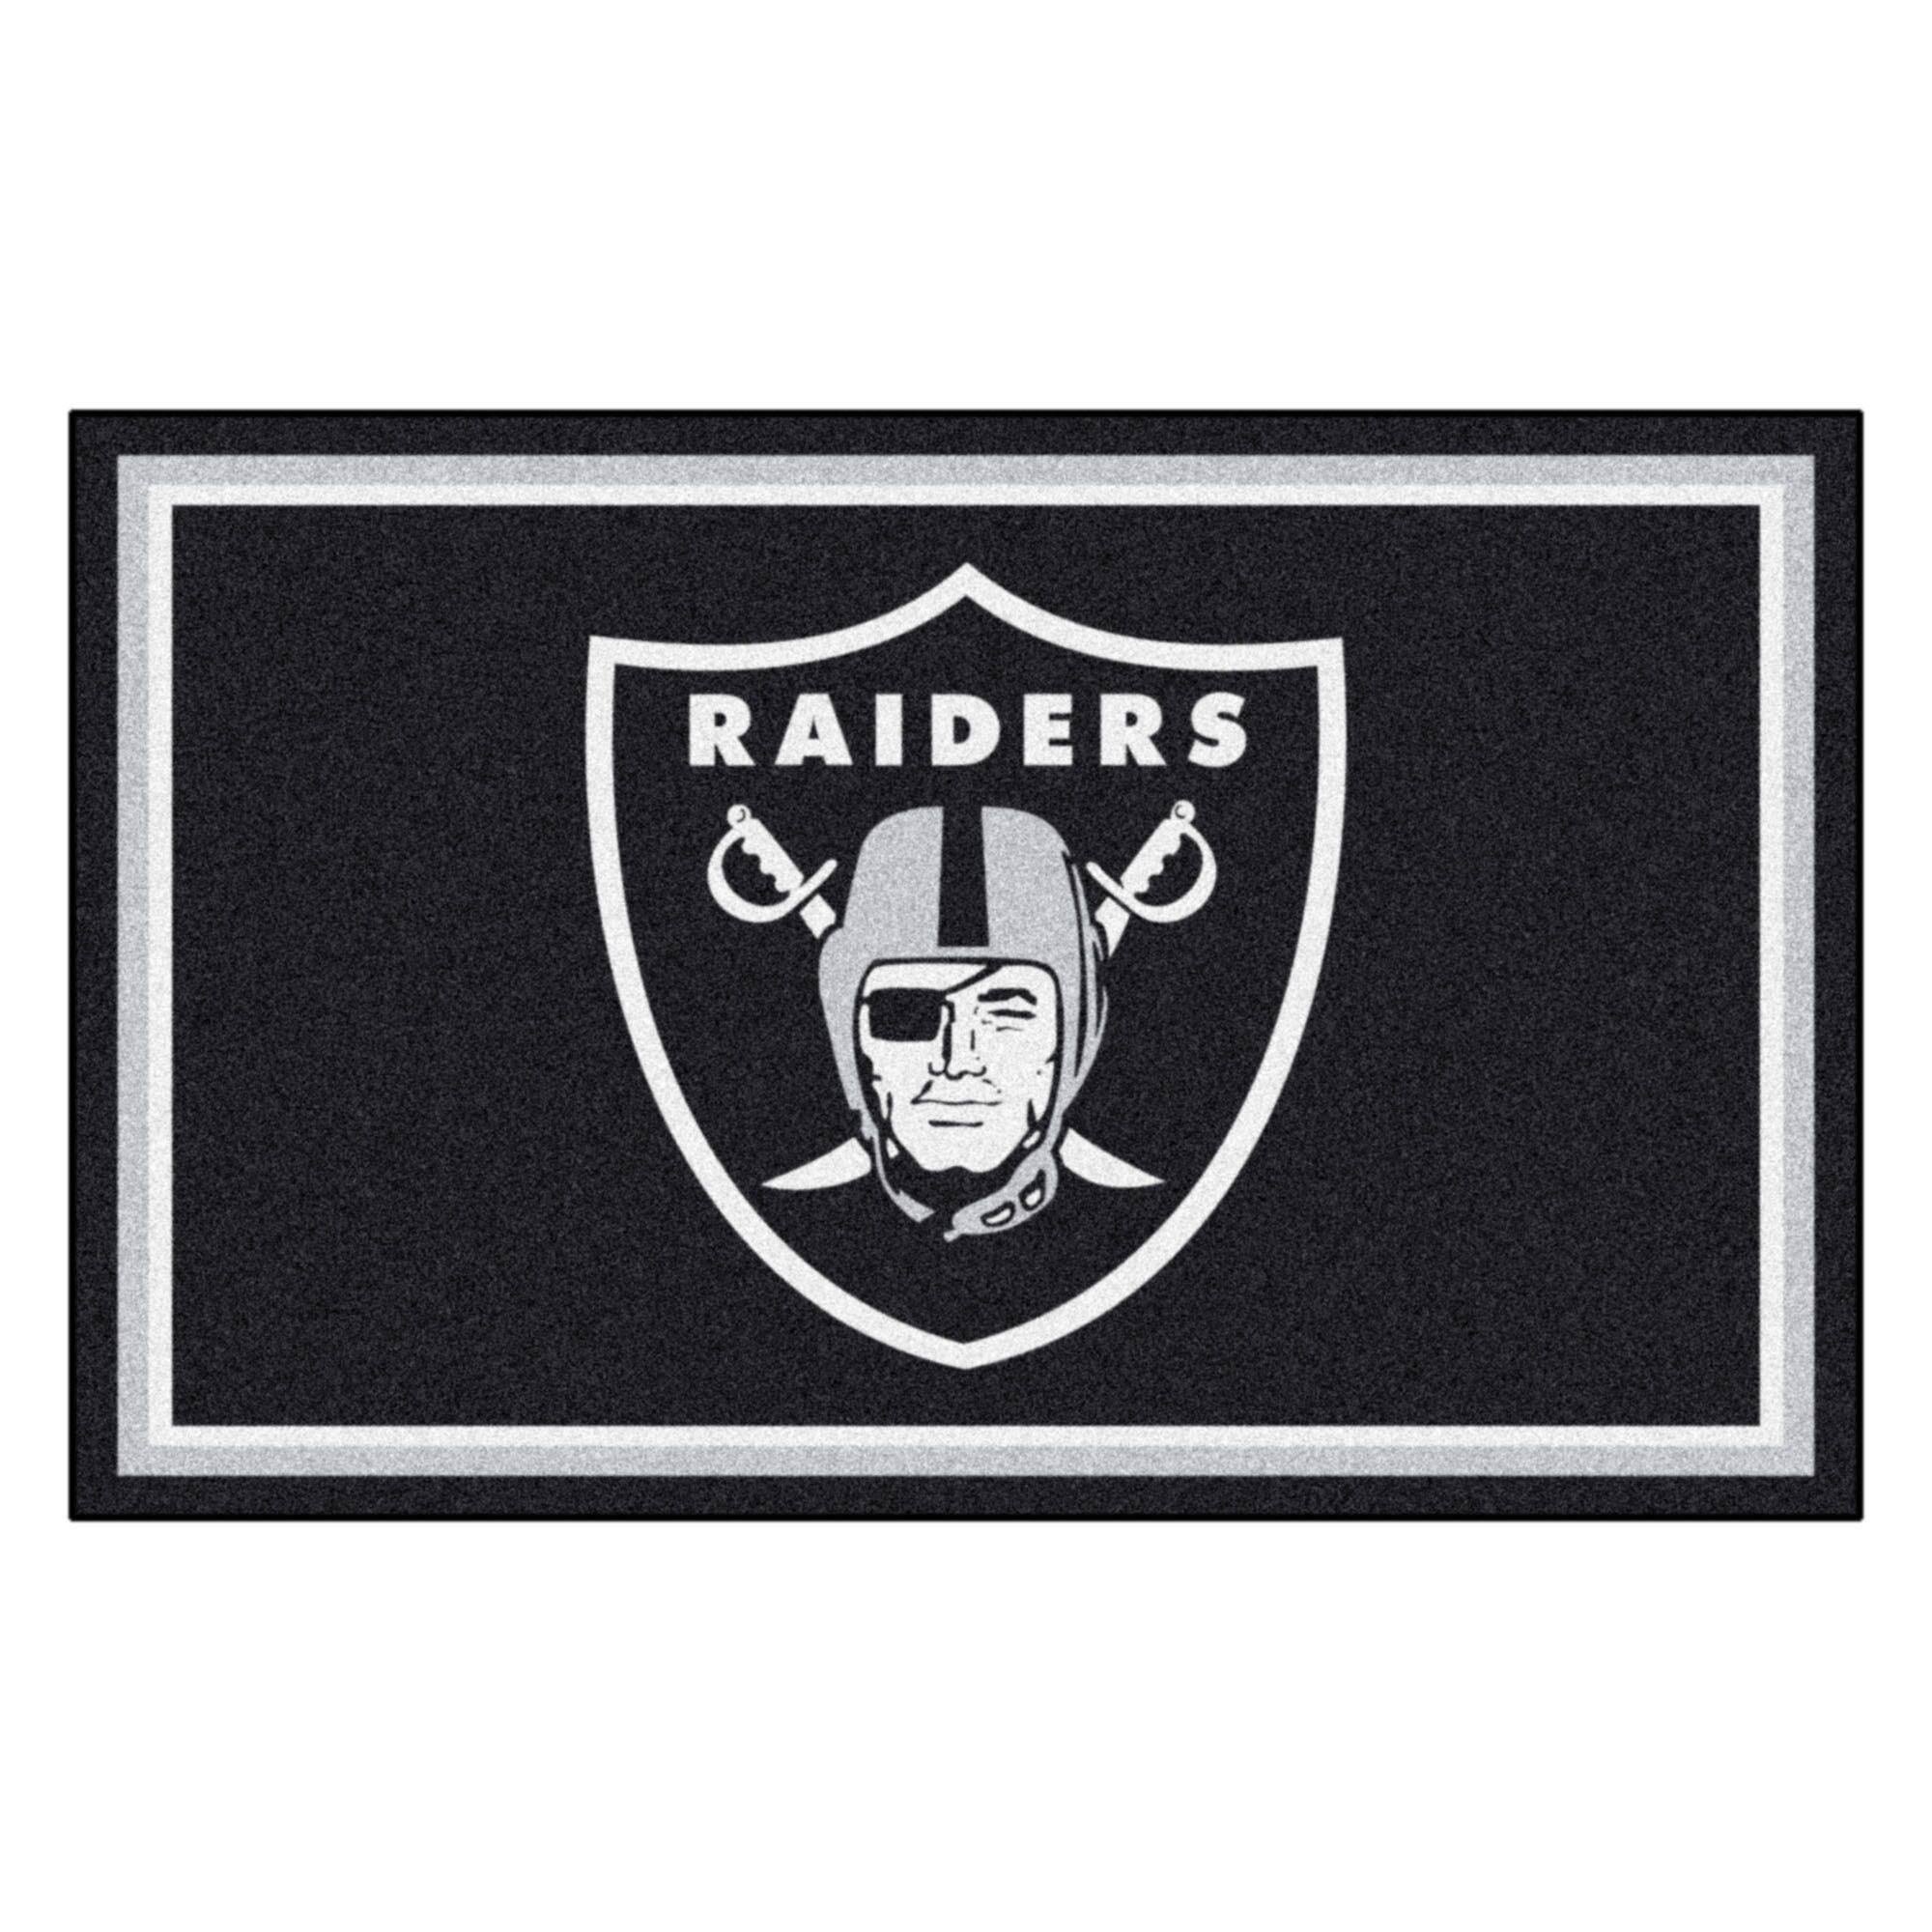 NFL - Oakland Raiders 4x6 Rug Mat Size: 4' x 6'